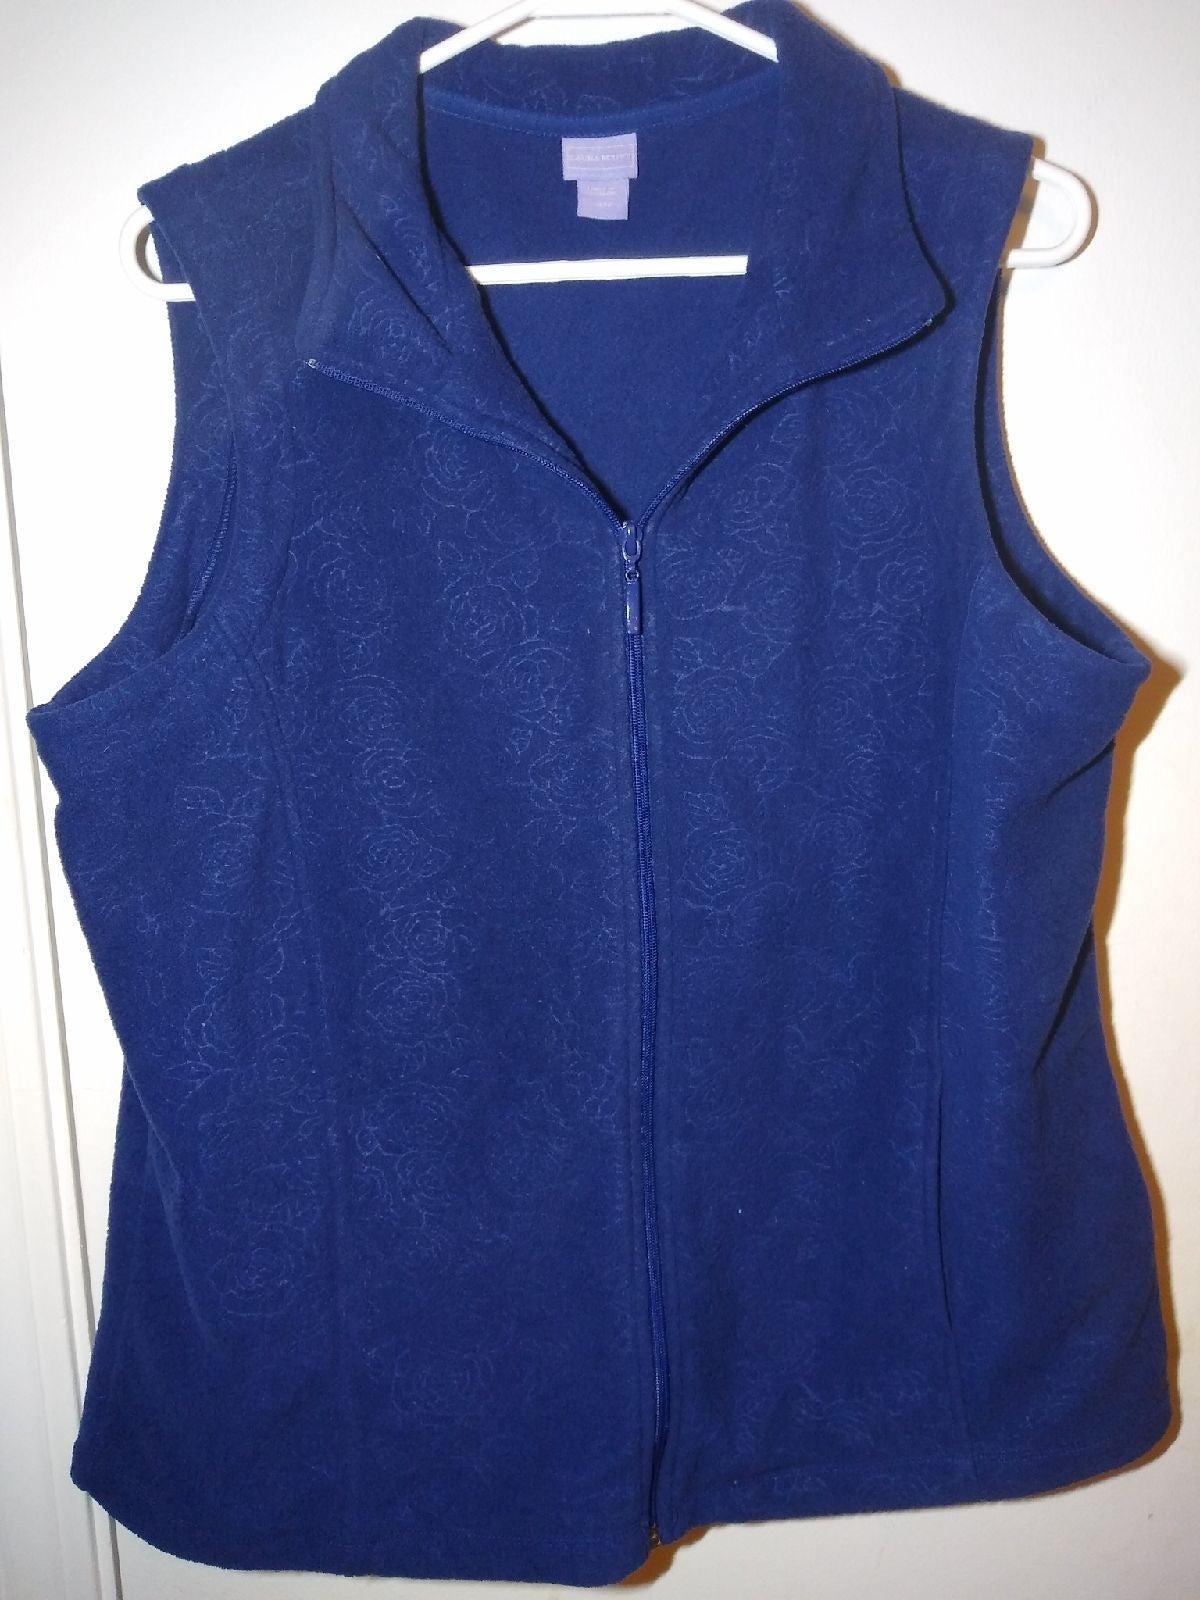 Women's Laura Scott XL Navy blue Vest